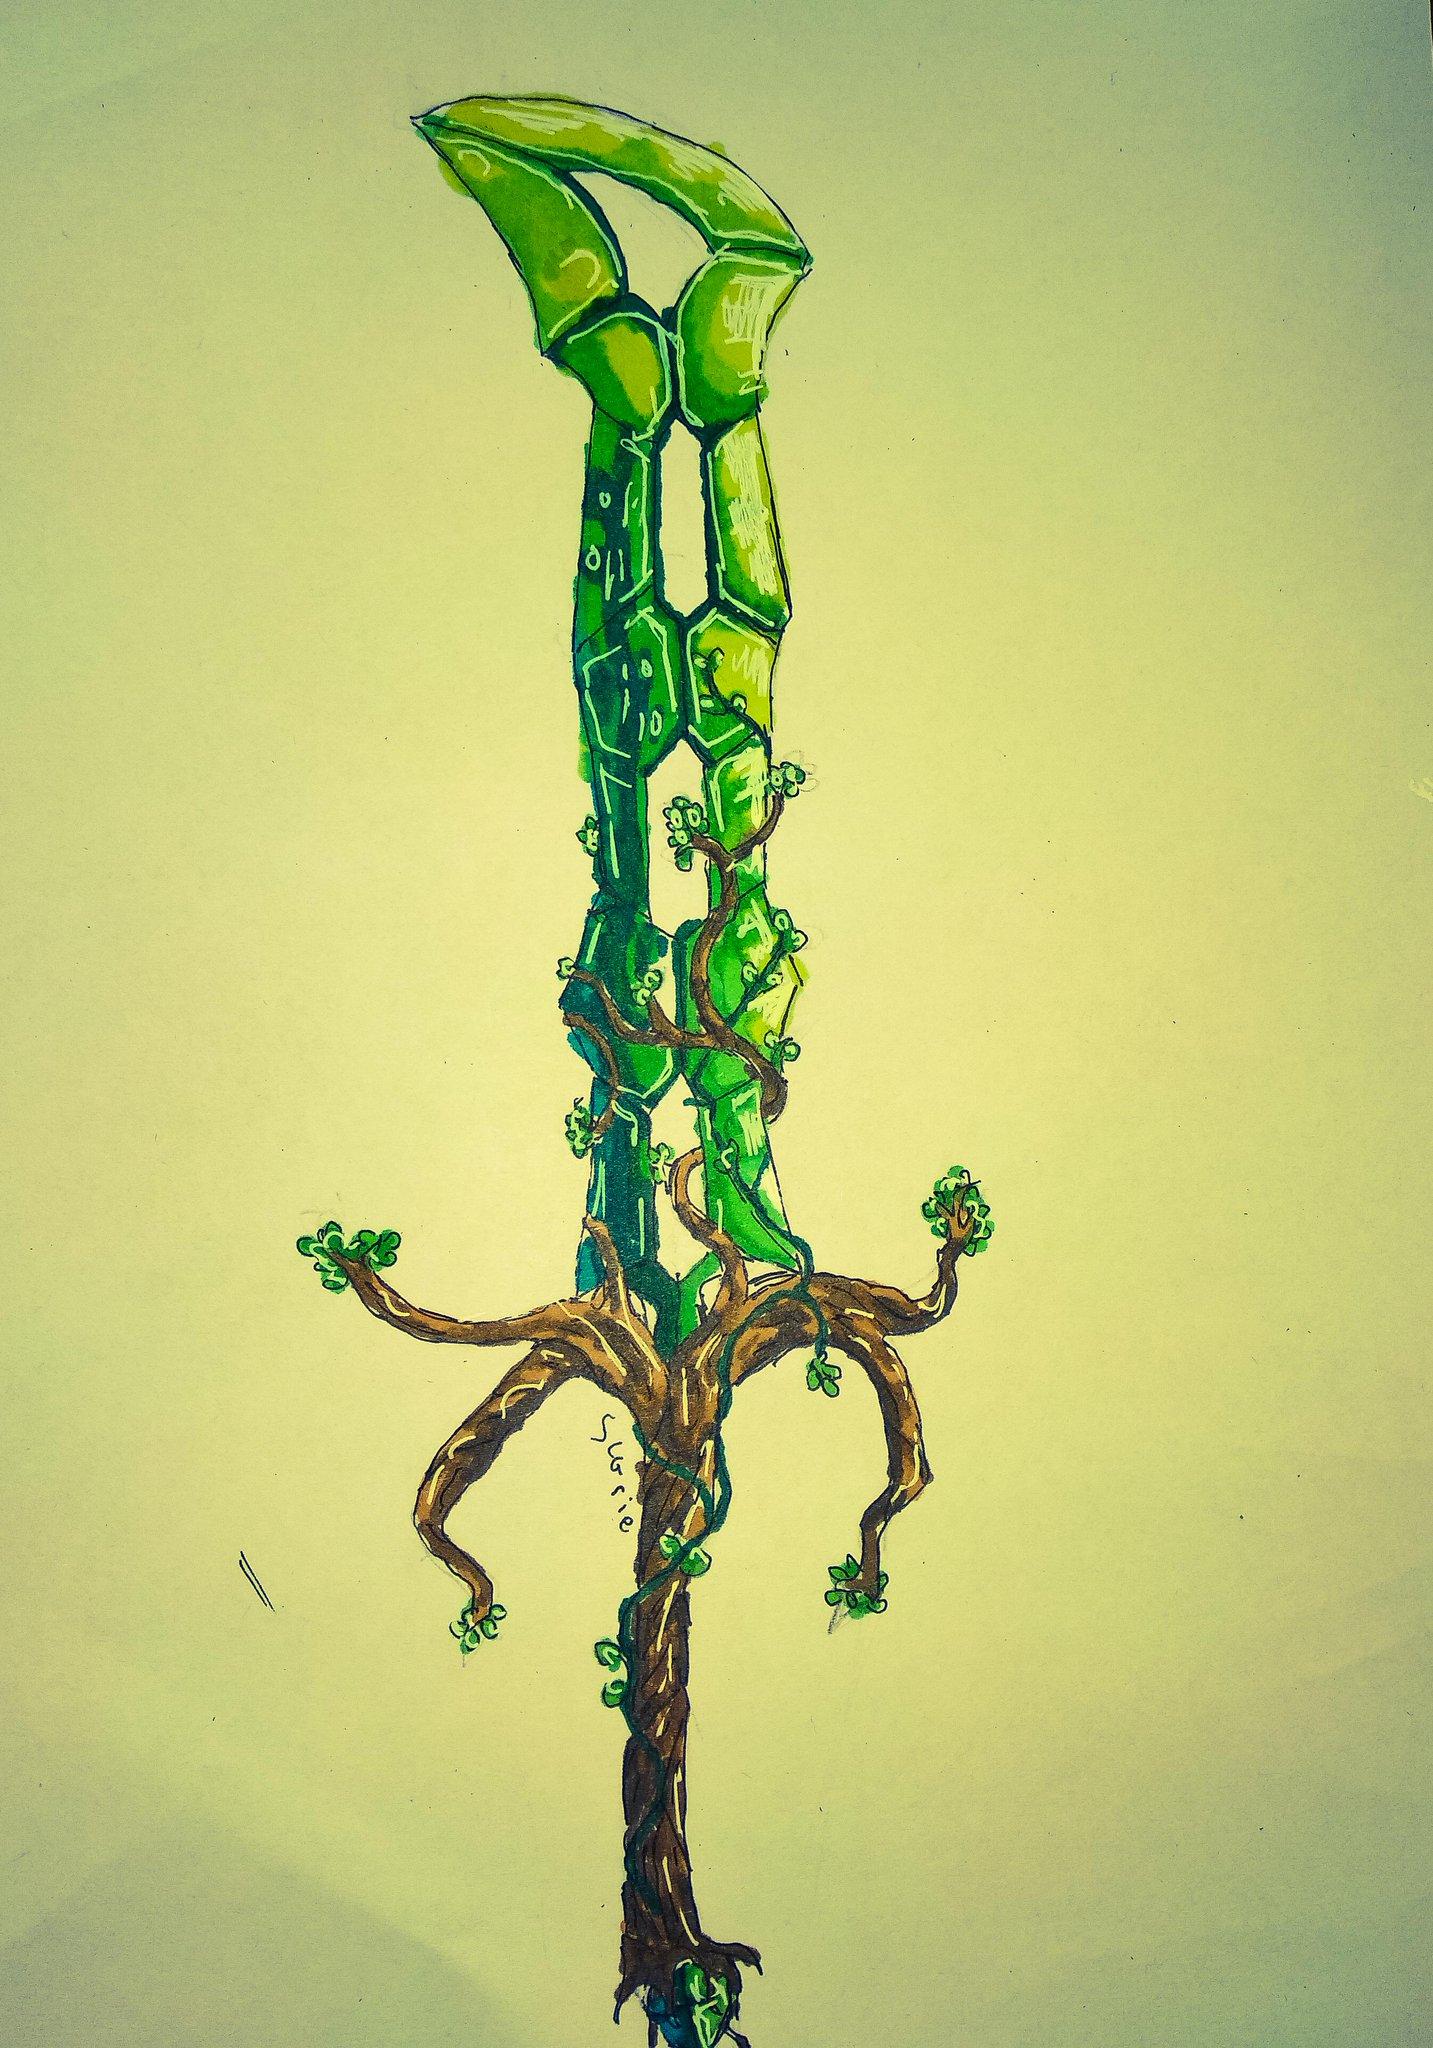 картинка терра меча